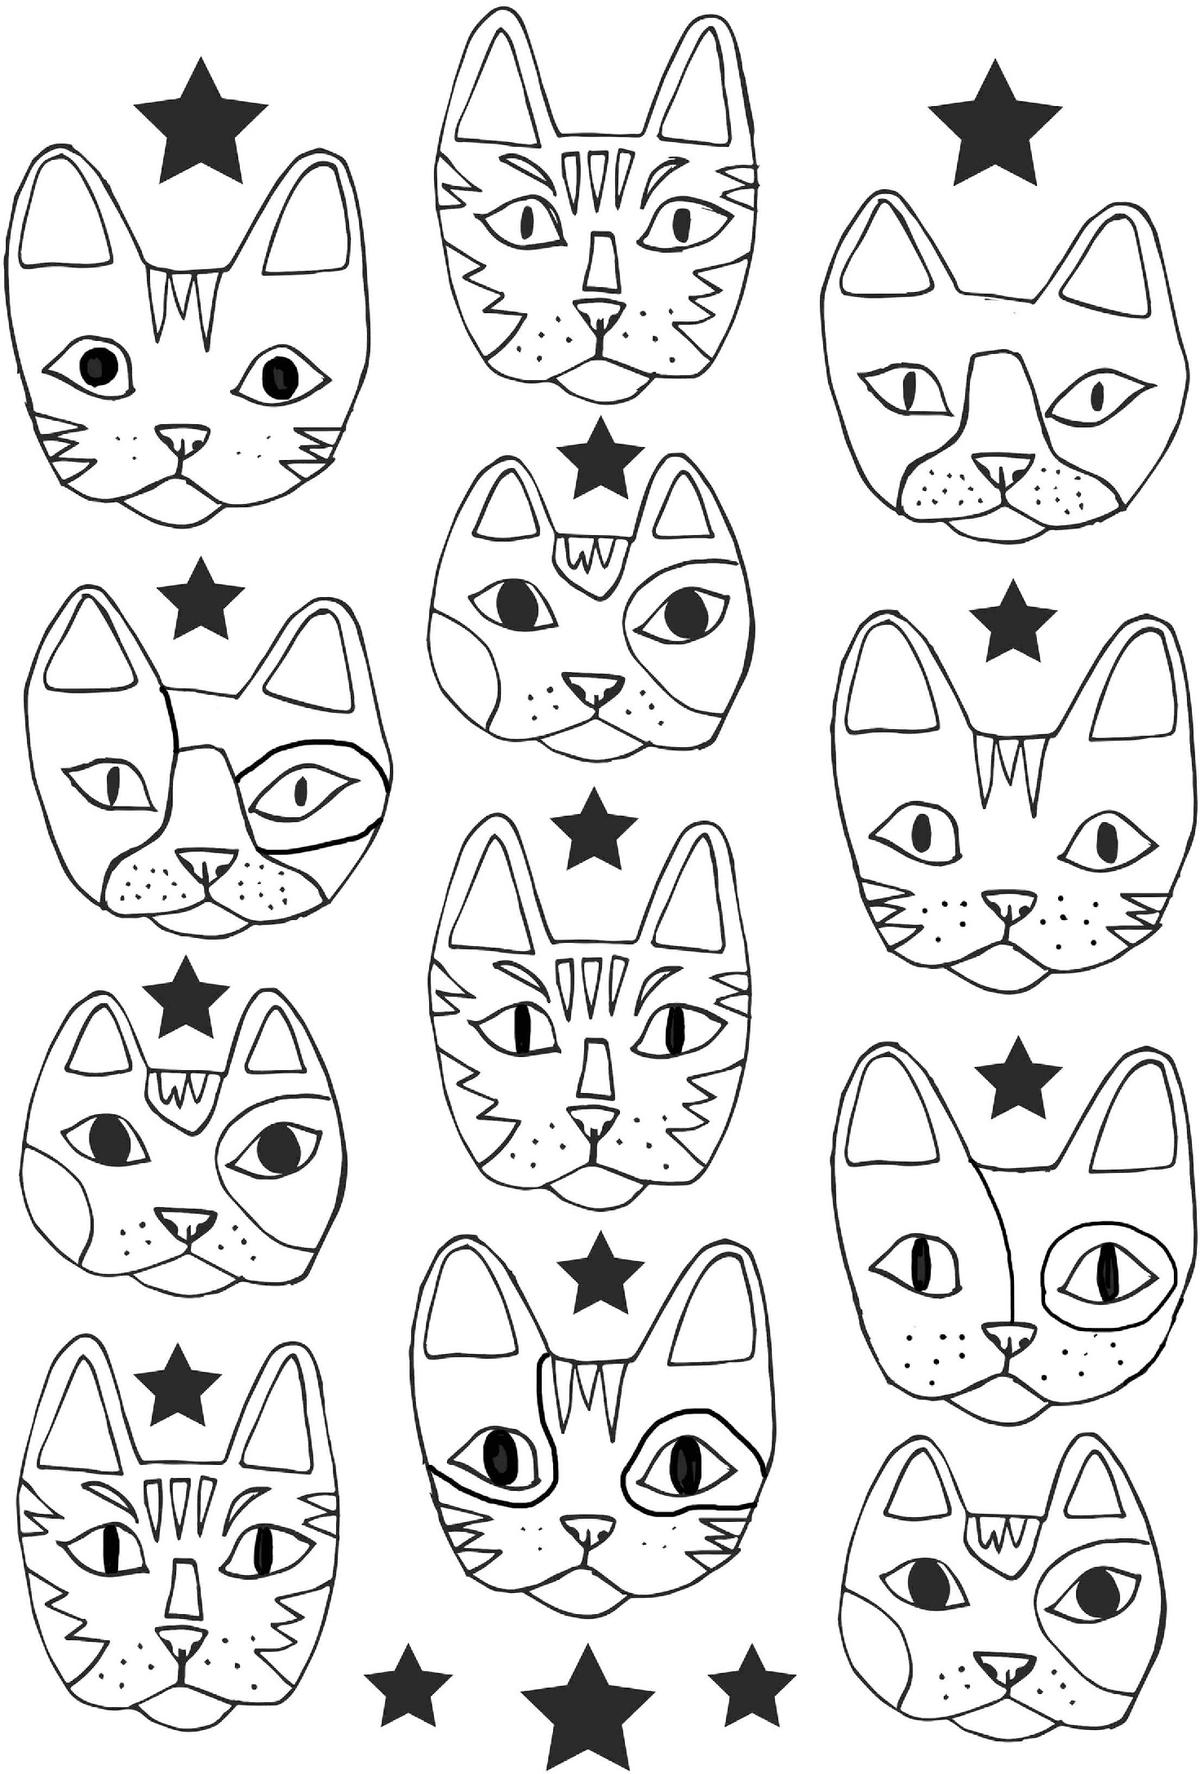 Распечатать картинки кошек мордашки антистресс